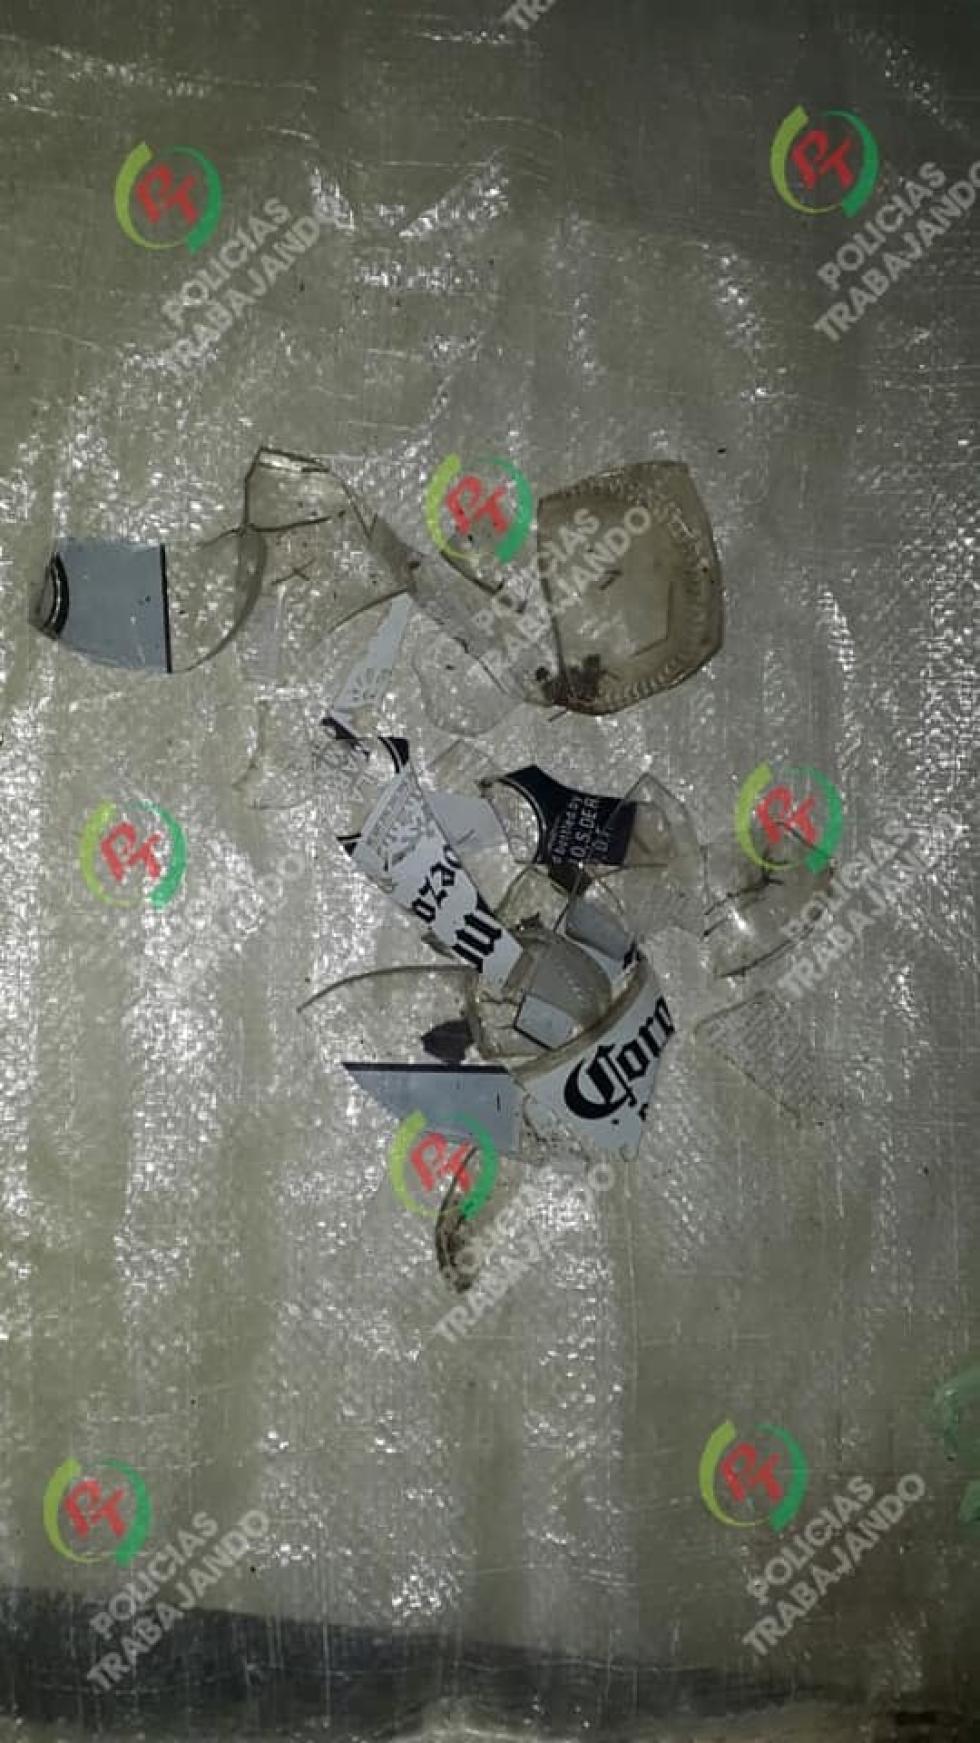 vaso roto.jpg